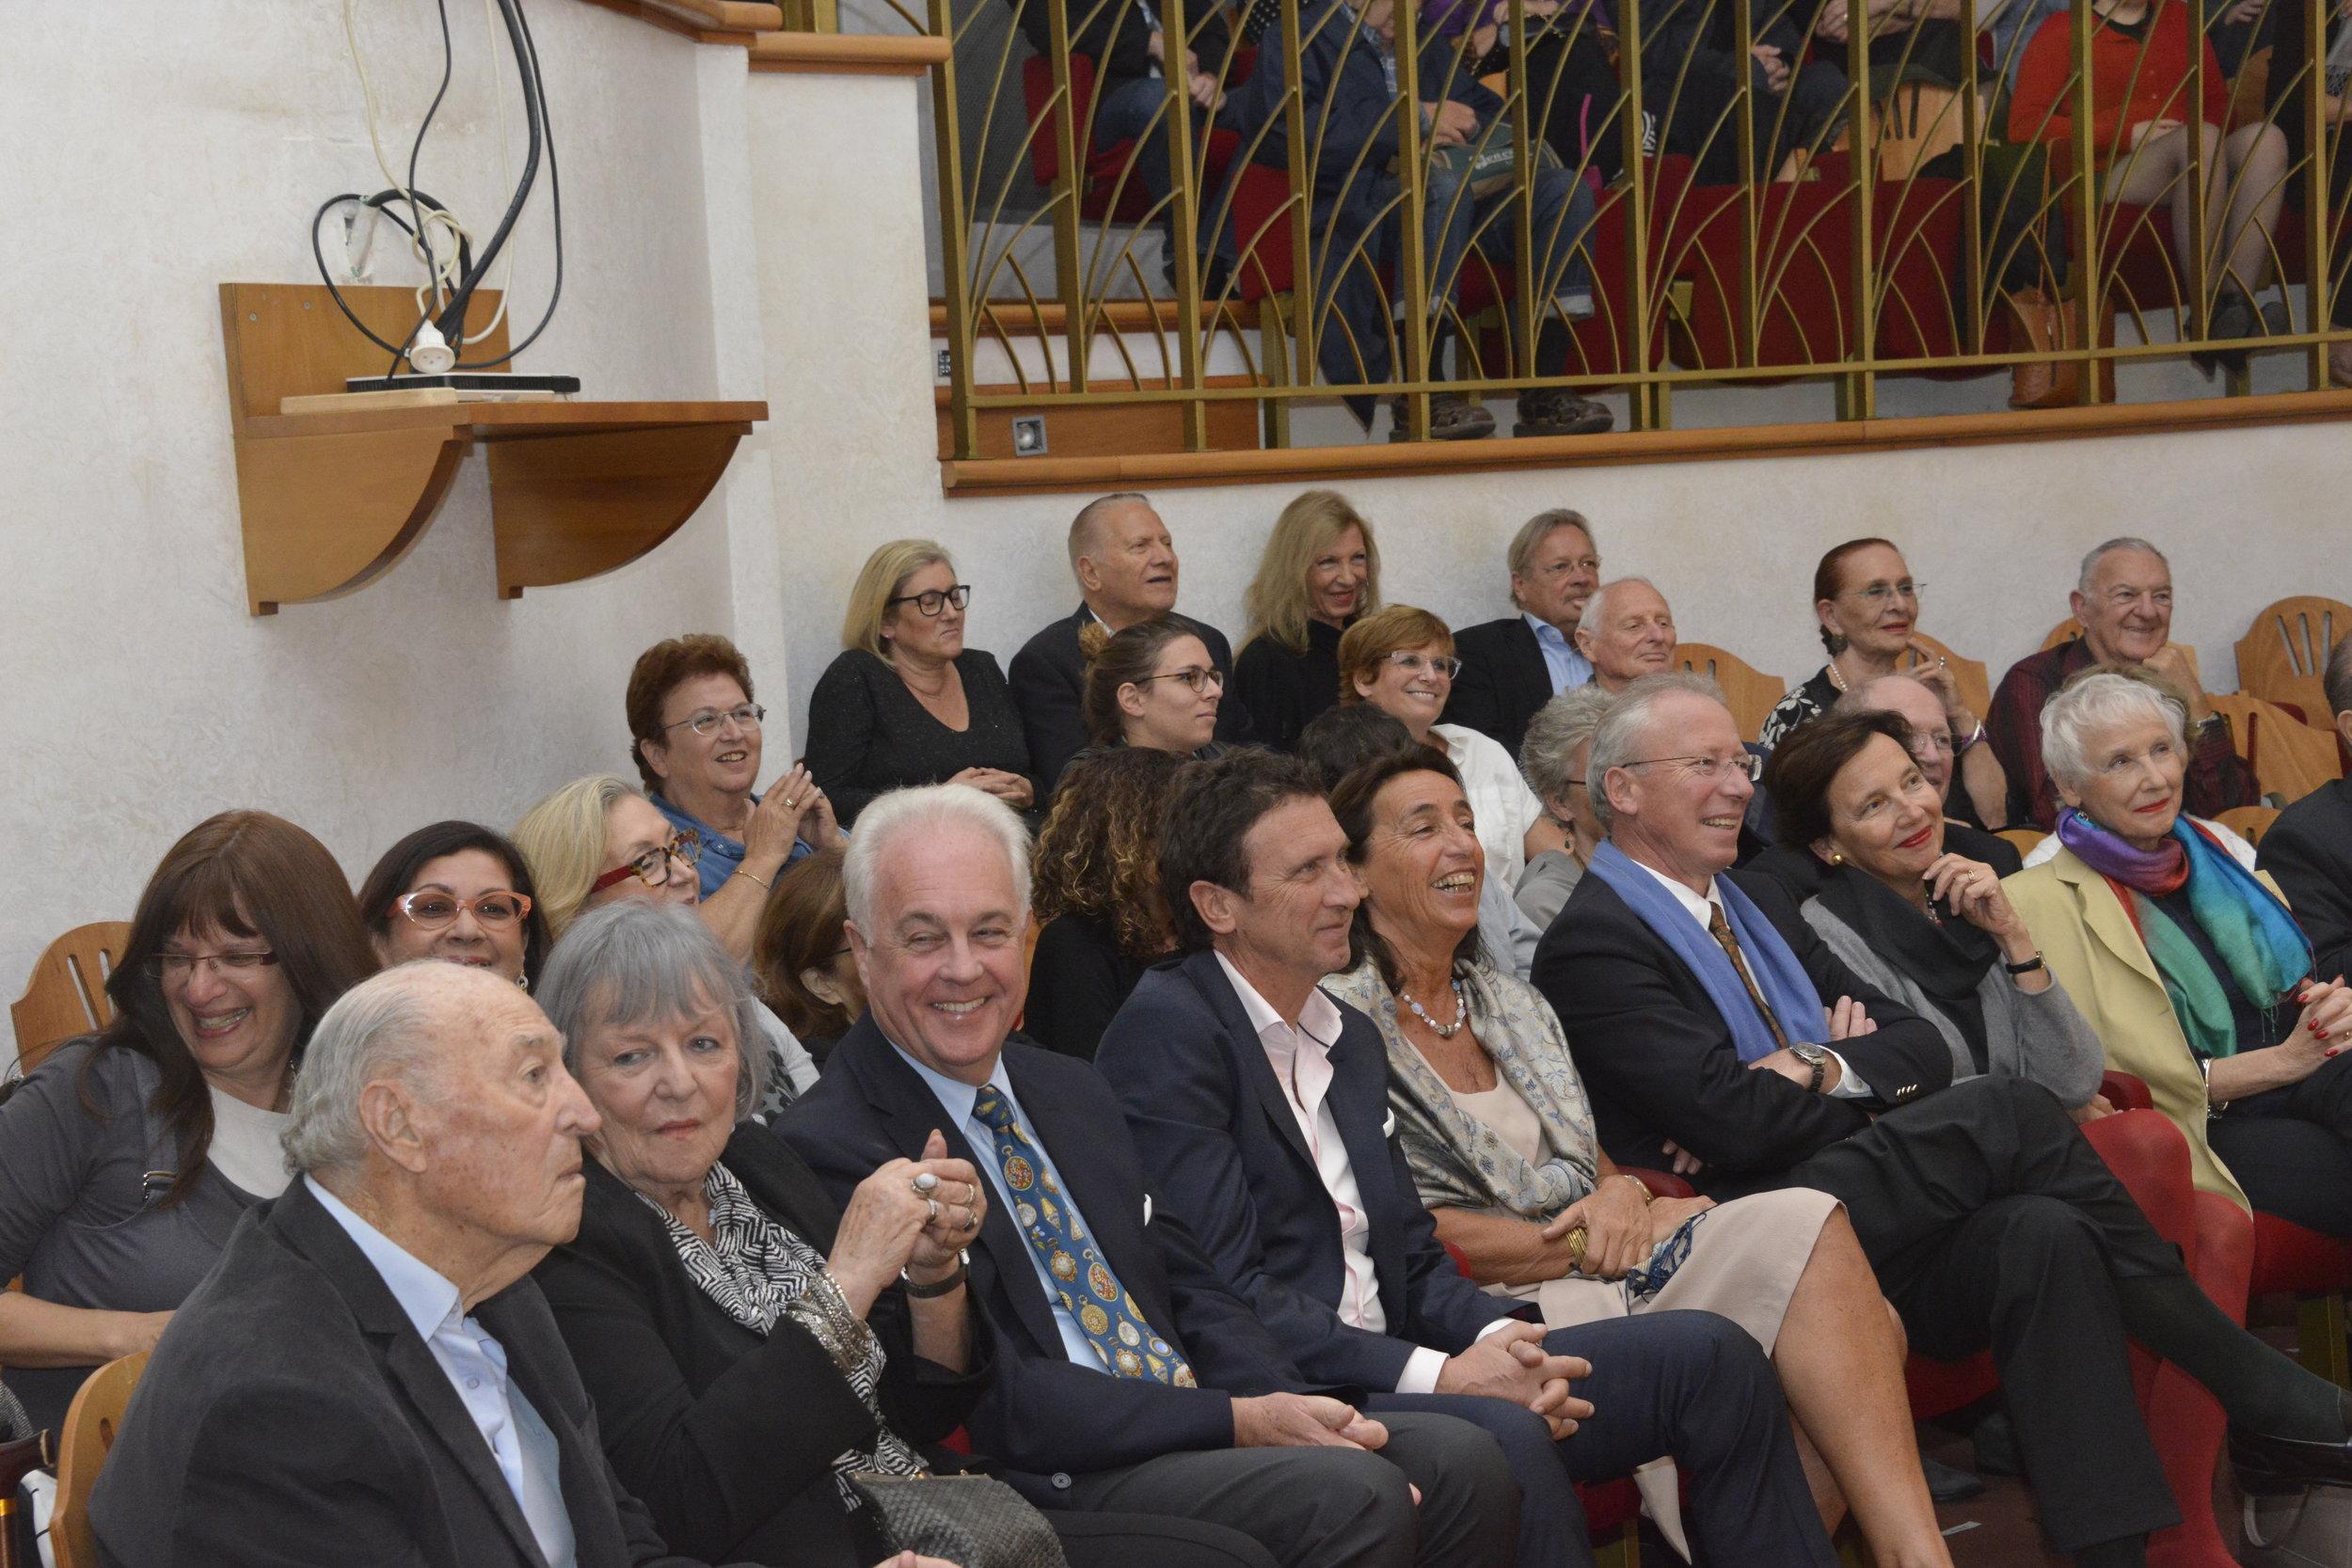 kultur 2014-800 32 tel Aviv 279.jpg